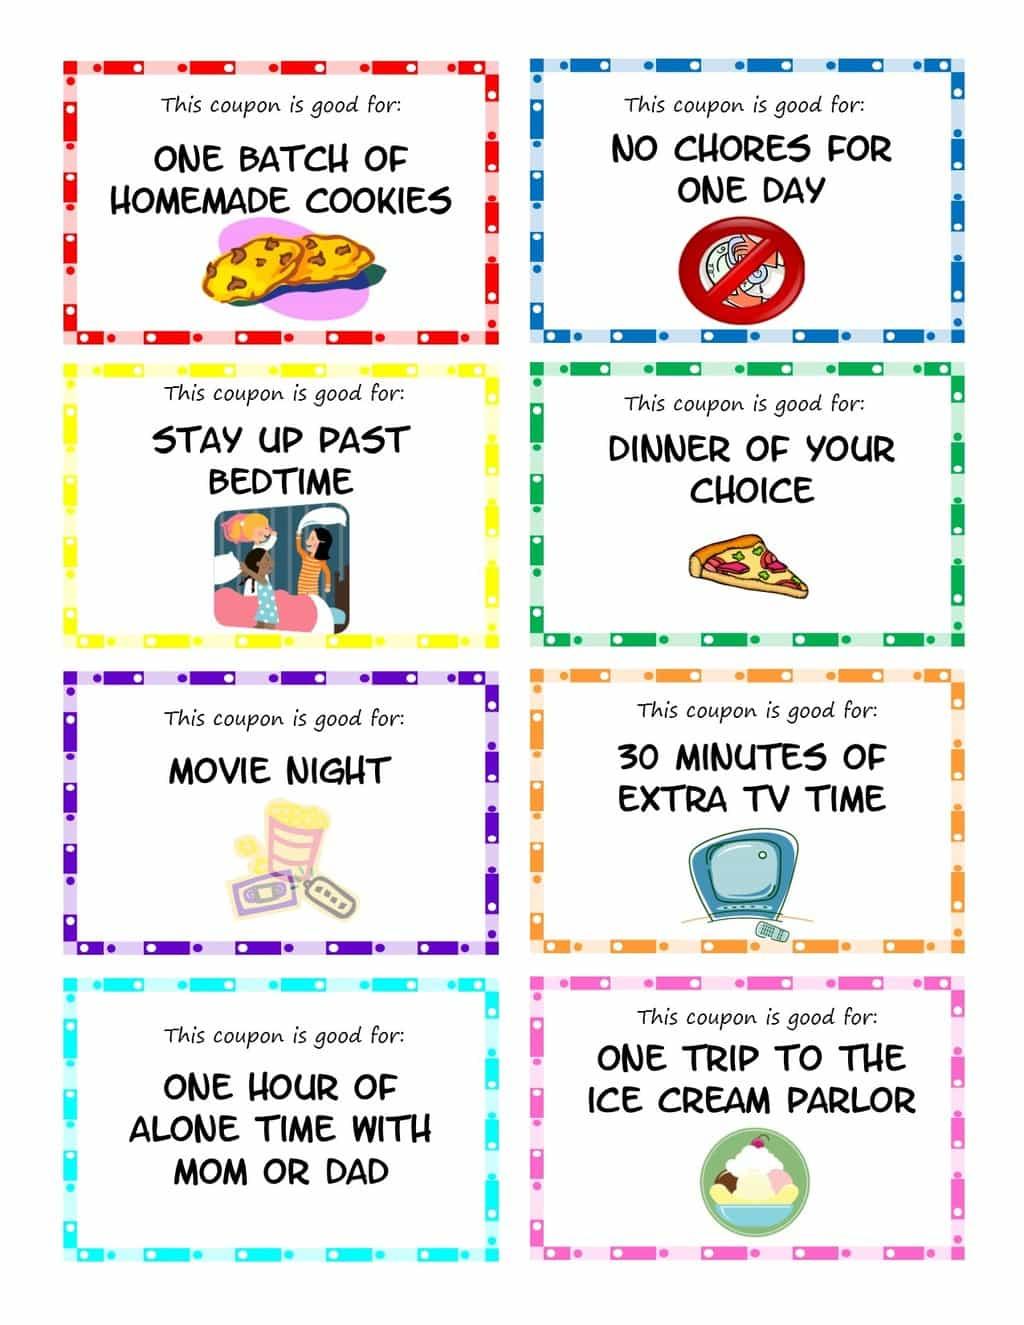 Printable Kid Coupons - Make Your Own Printable Coupons For Free